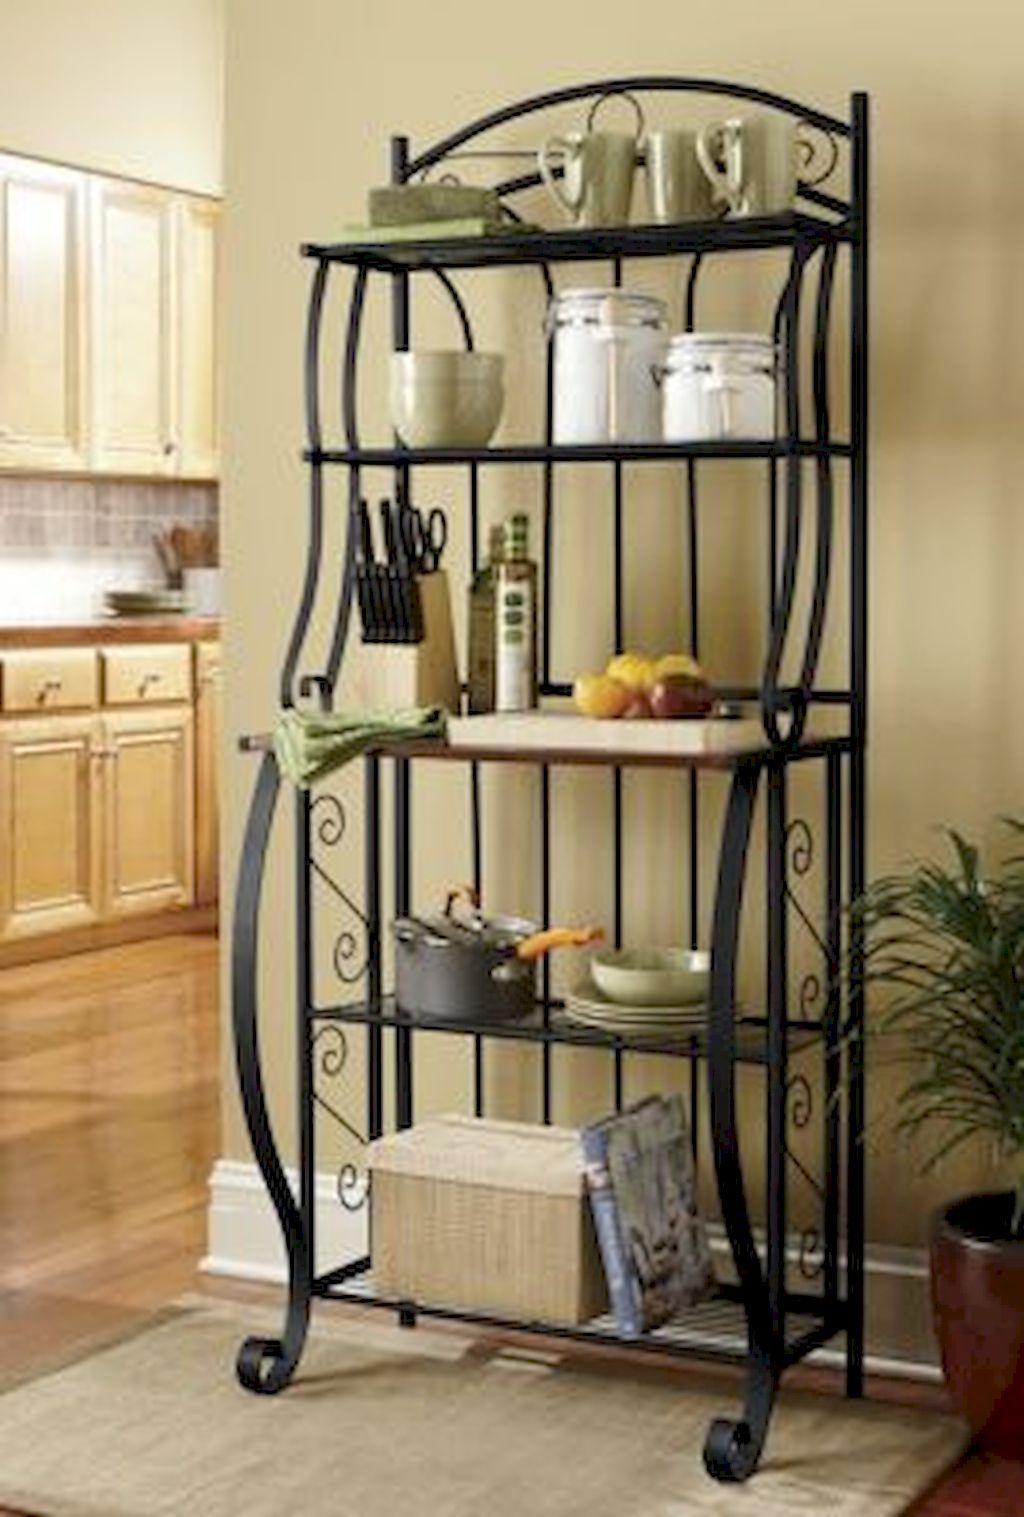 Cool 19 Smart Solution Standing Rack Kitchen Decor Ideas https